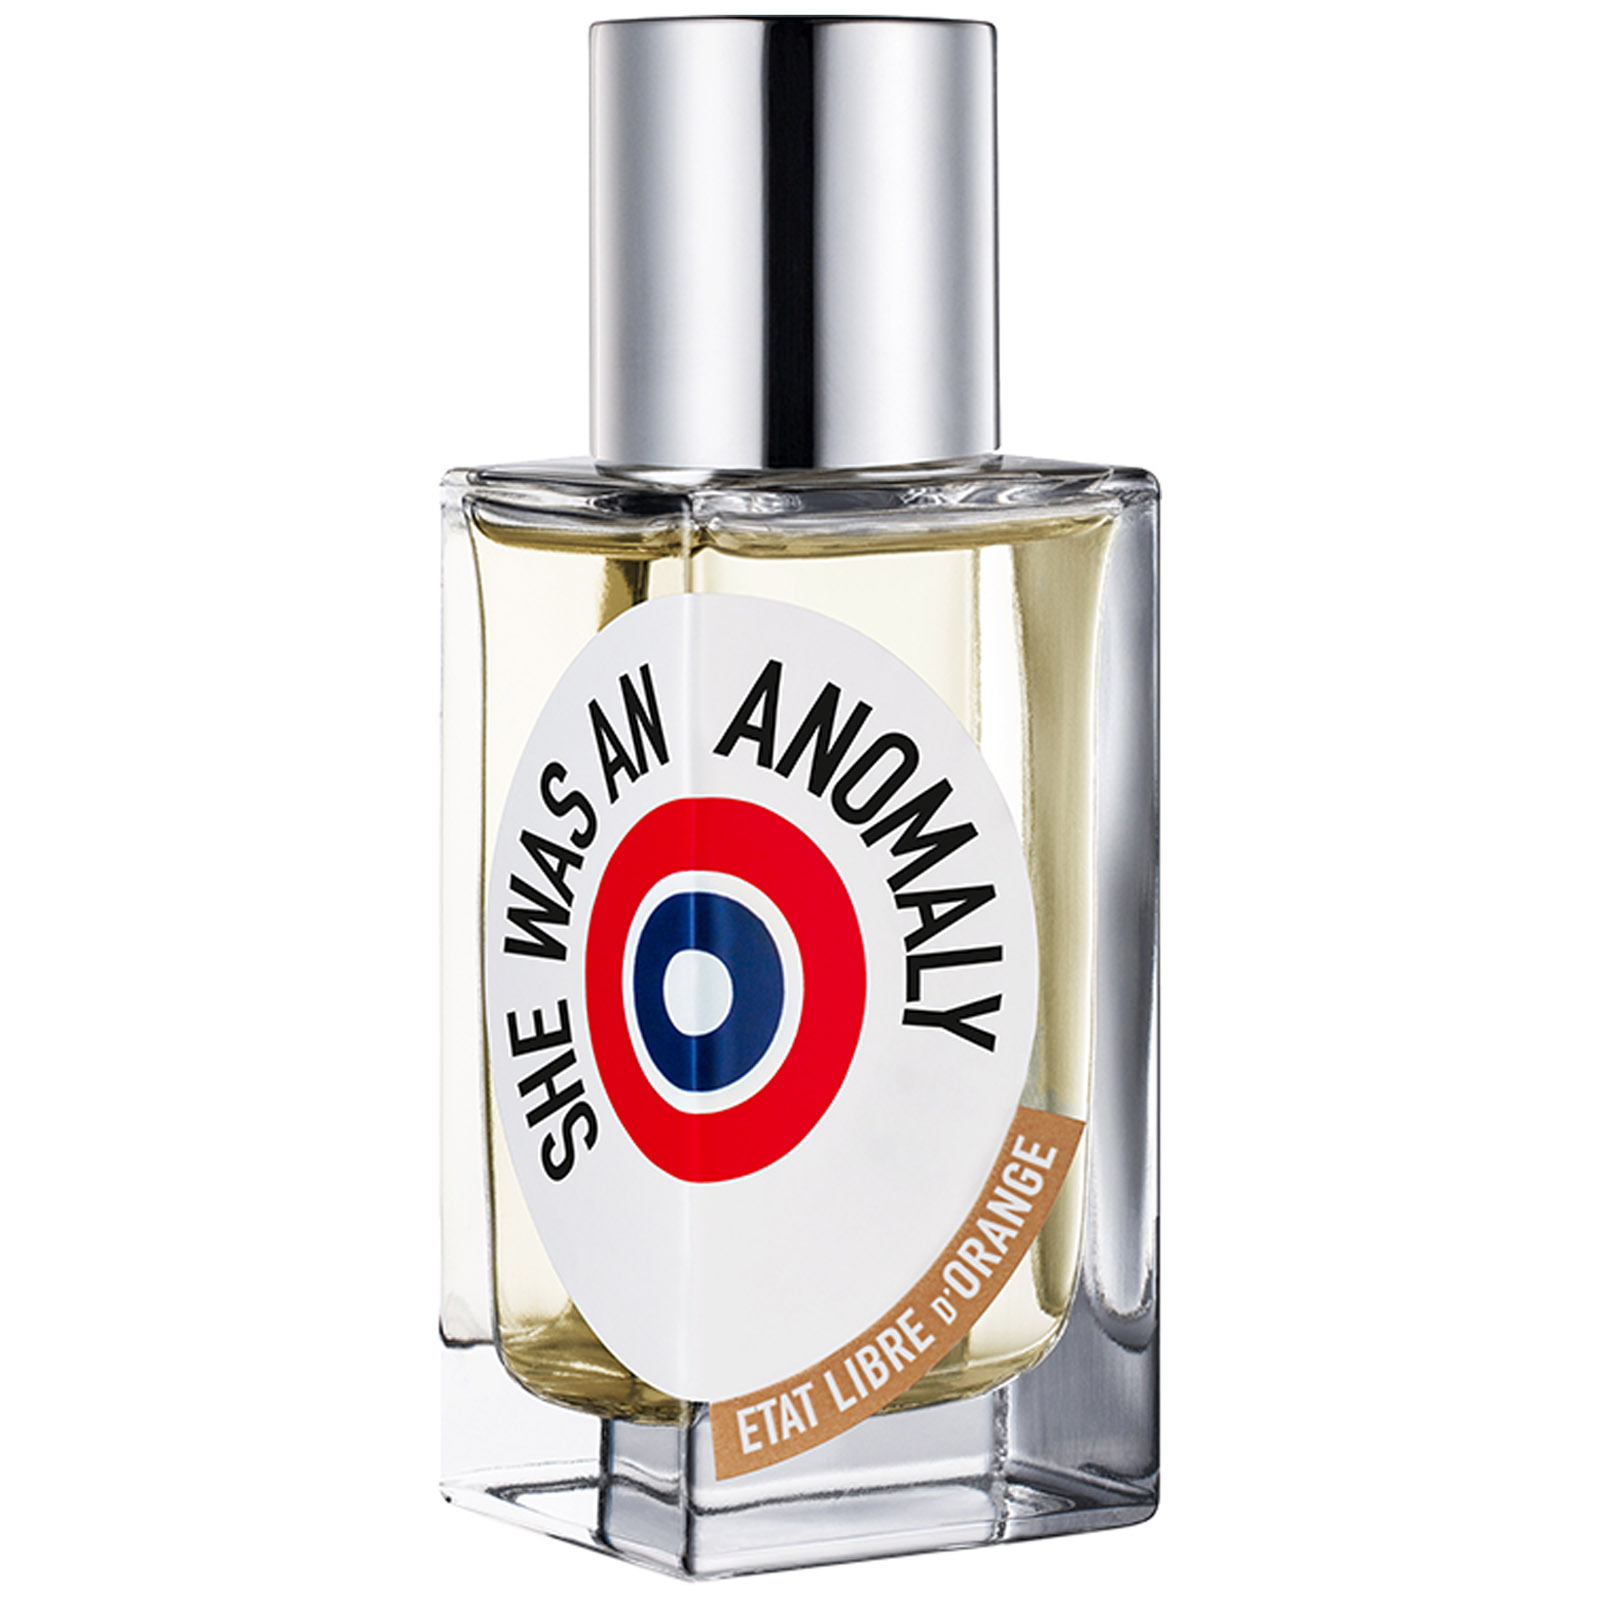 Eau de parfum Etat Libre d'Orange SHE WAS AN ANOMALY bianco   FRMODA.com